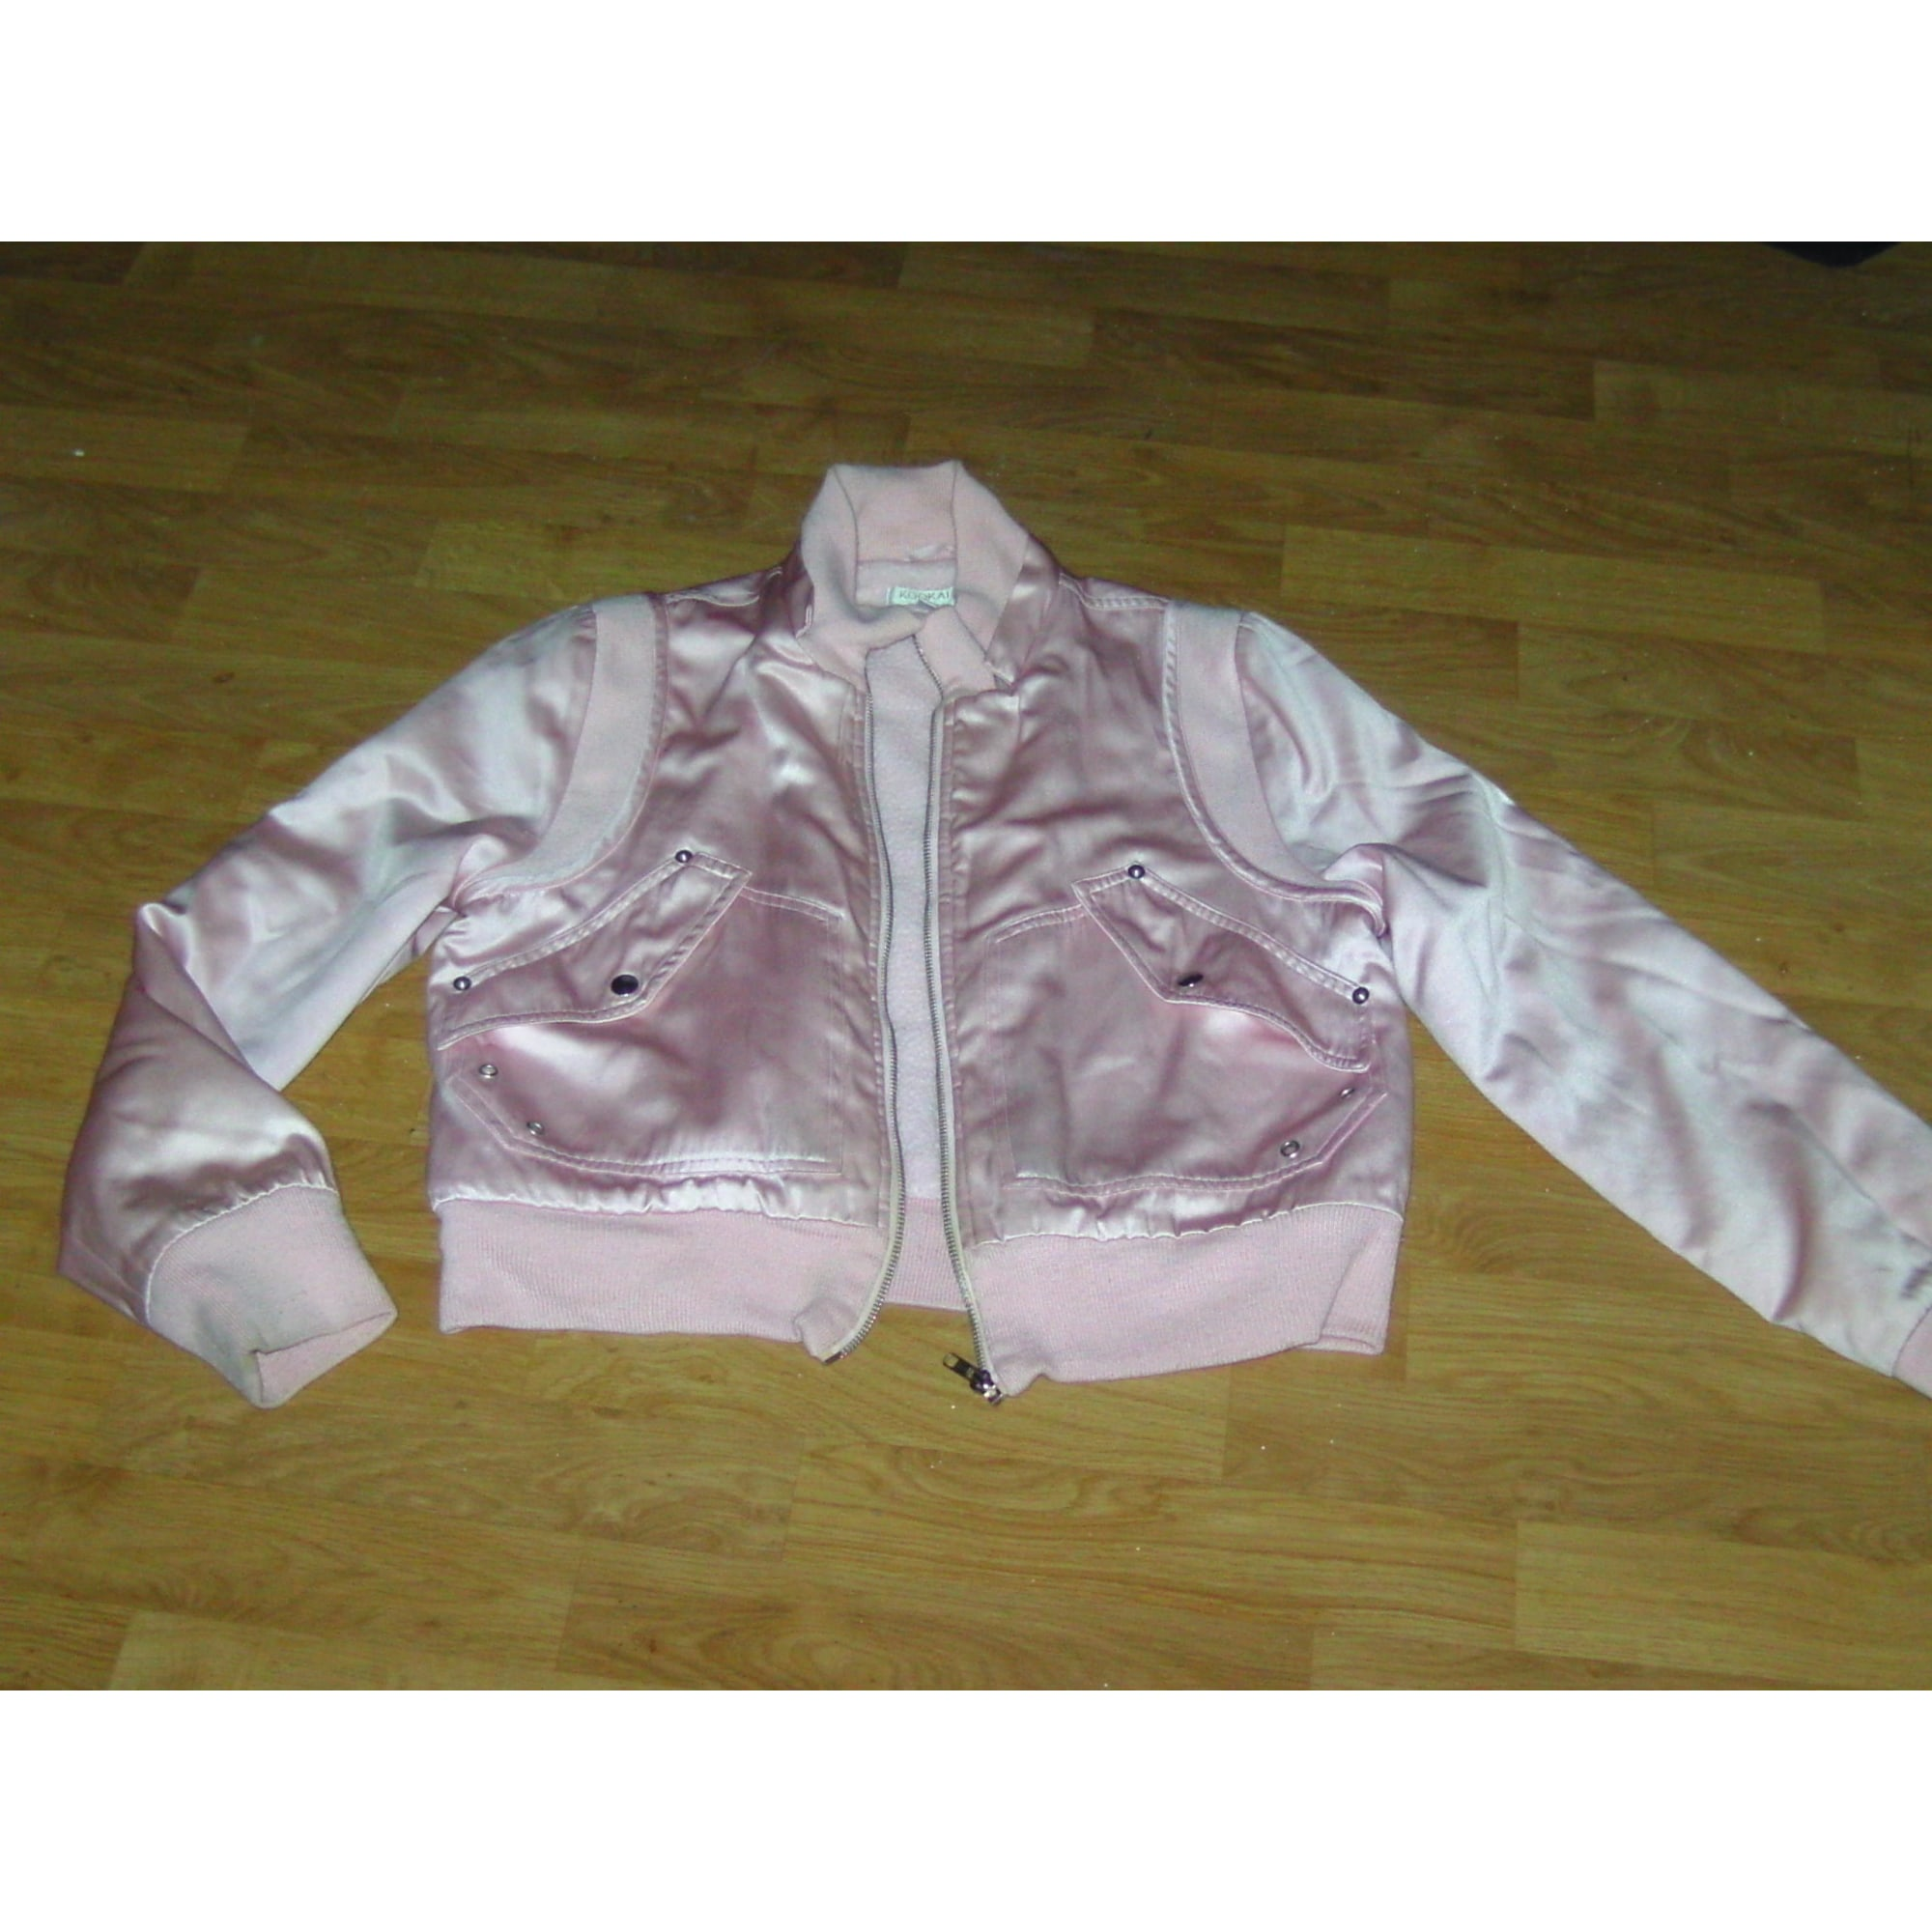 Zipped Jacket KOOKAI Pink, fuchsia, light pink